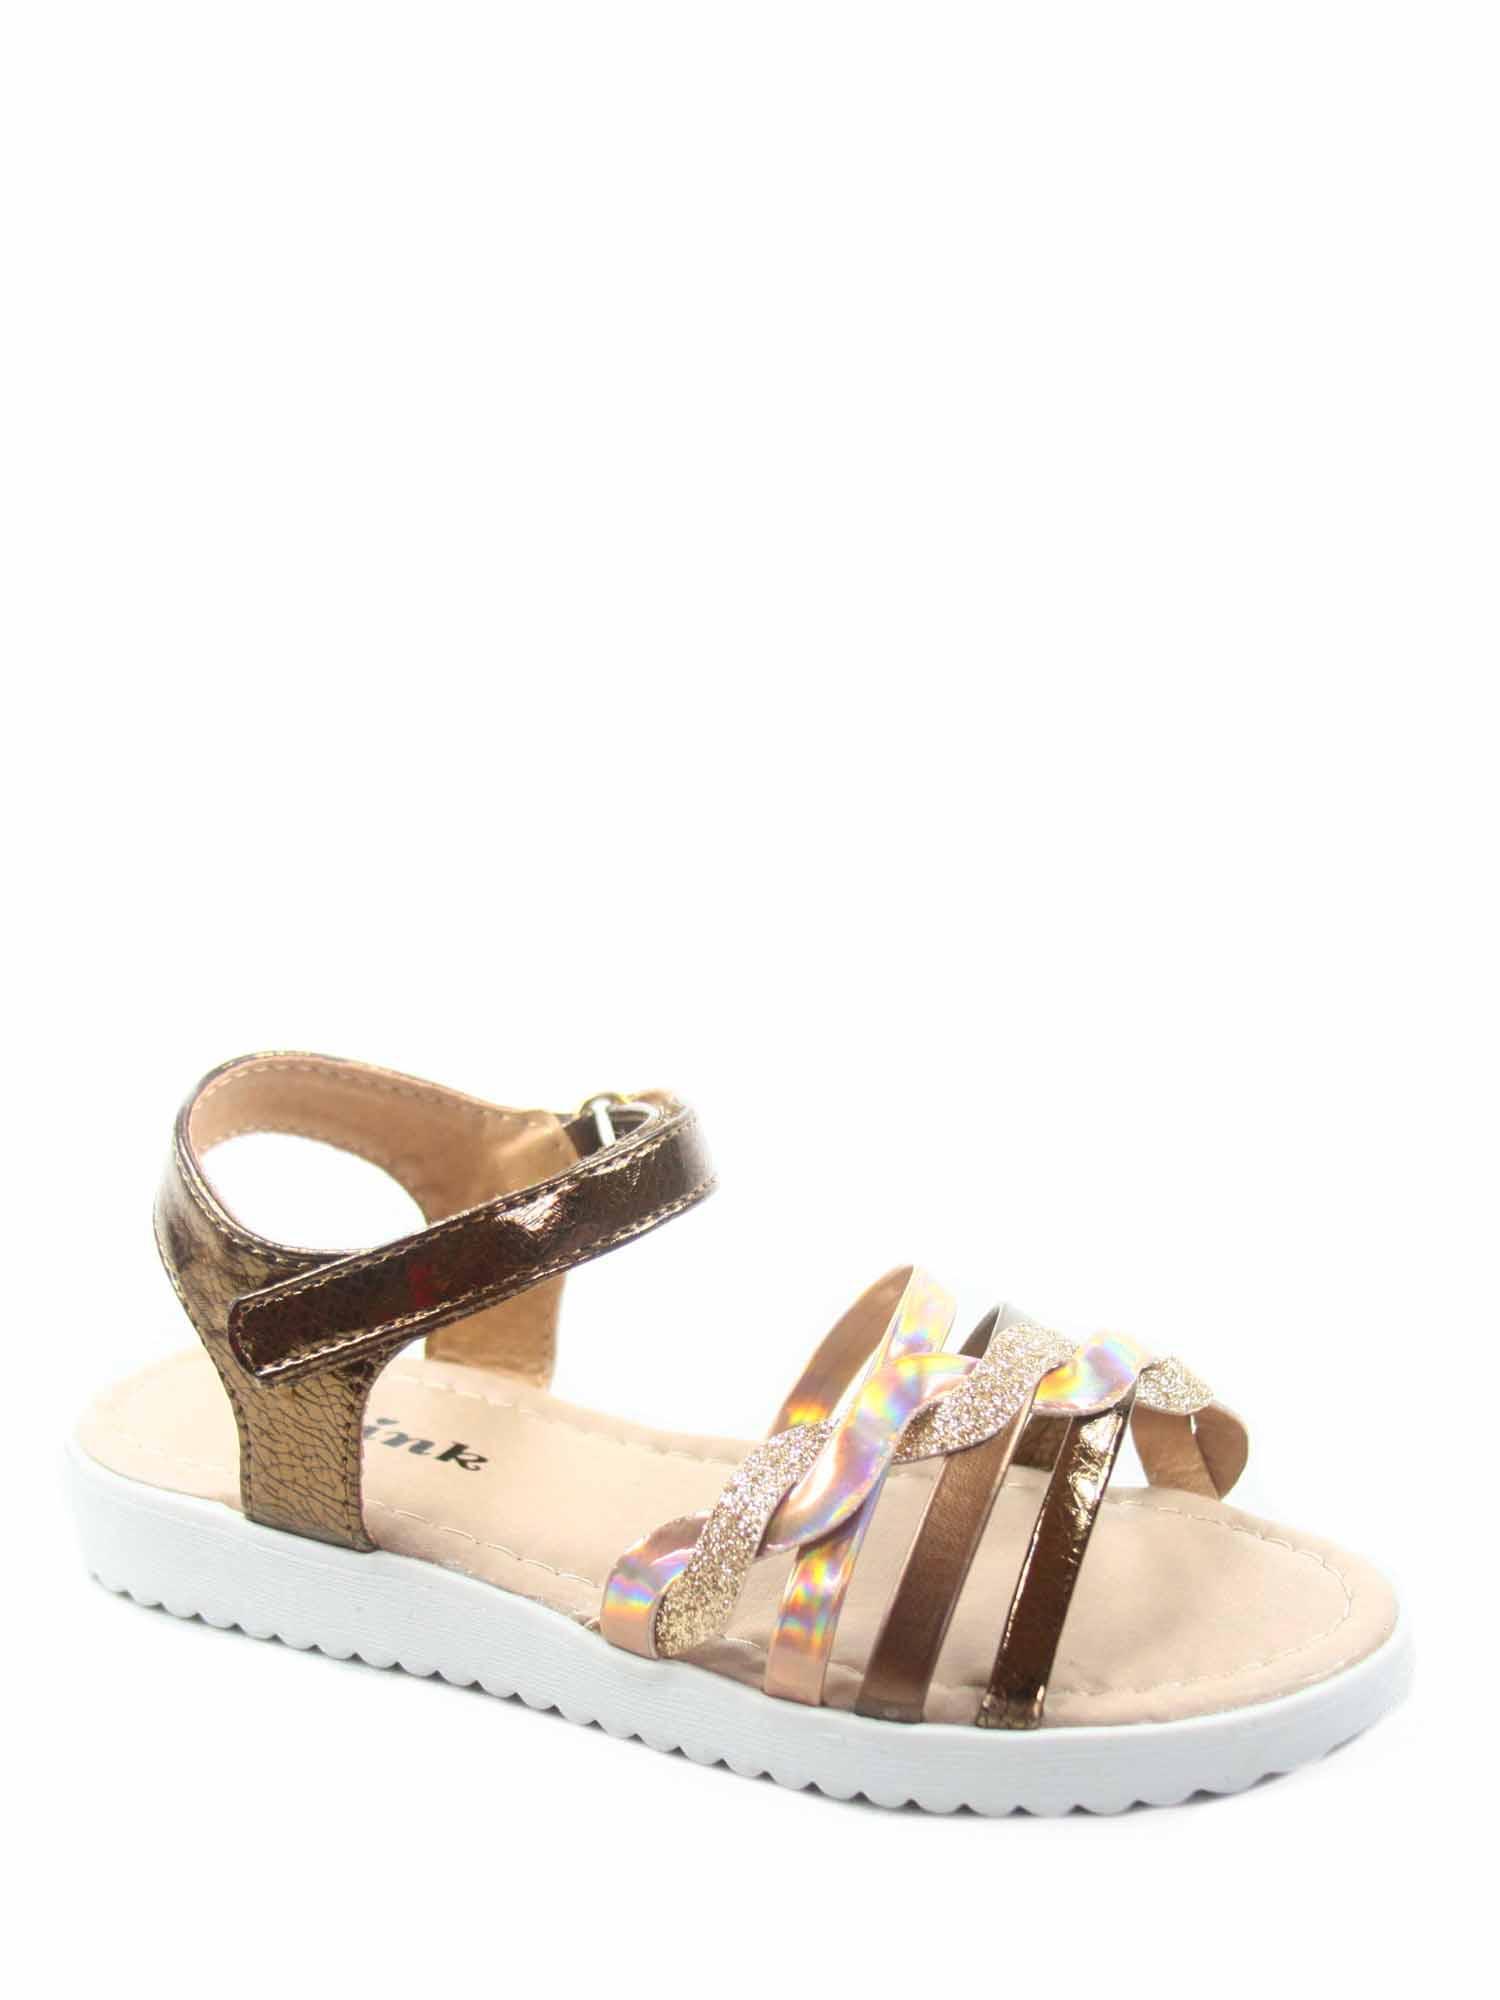 ffbc228343cac1 Link - Kristin-2k Link Youth Girl s Strappy Bling Gladiator Flat Heel Sandal  Shoes - Walmart.com